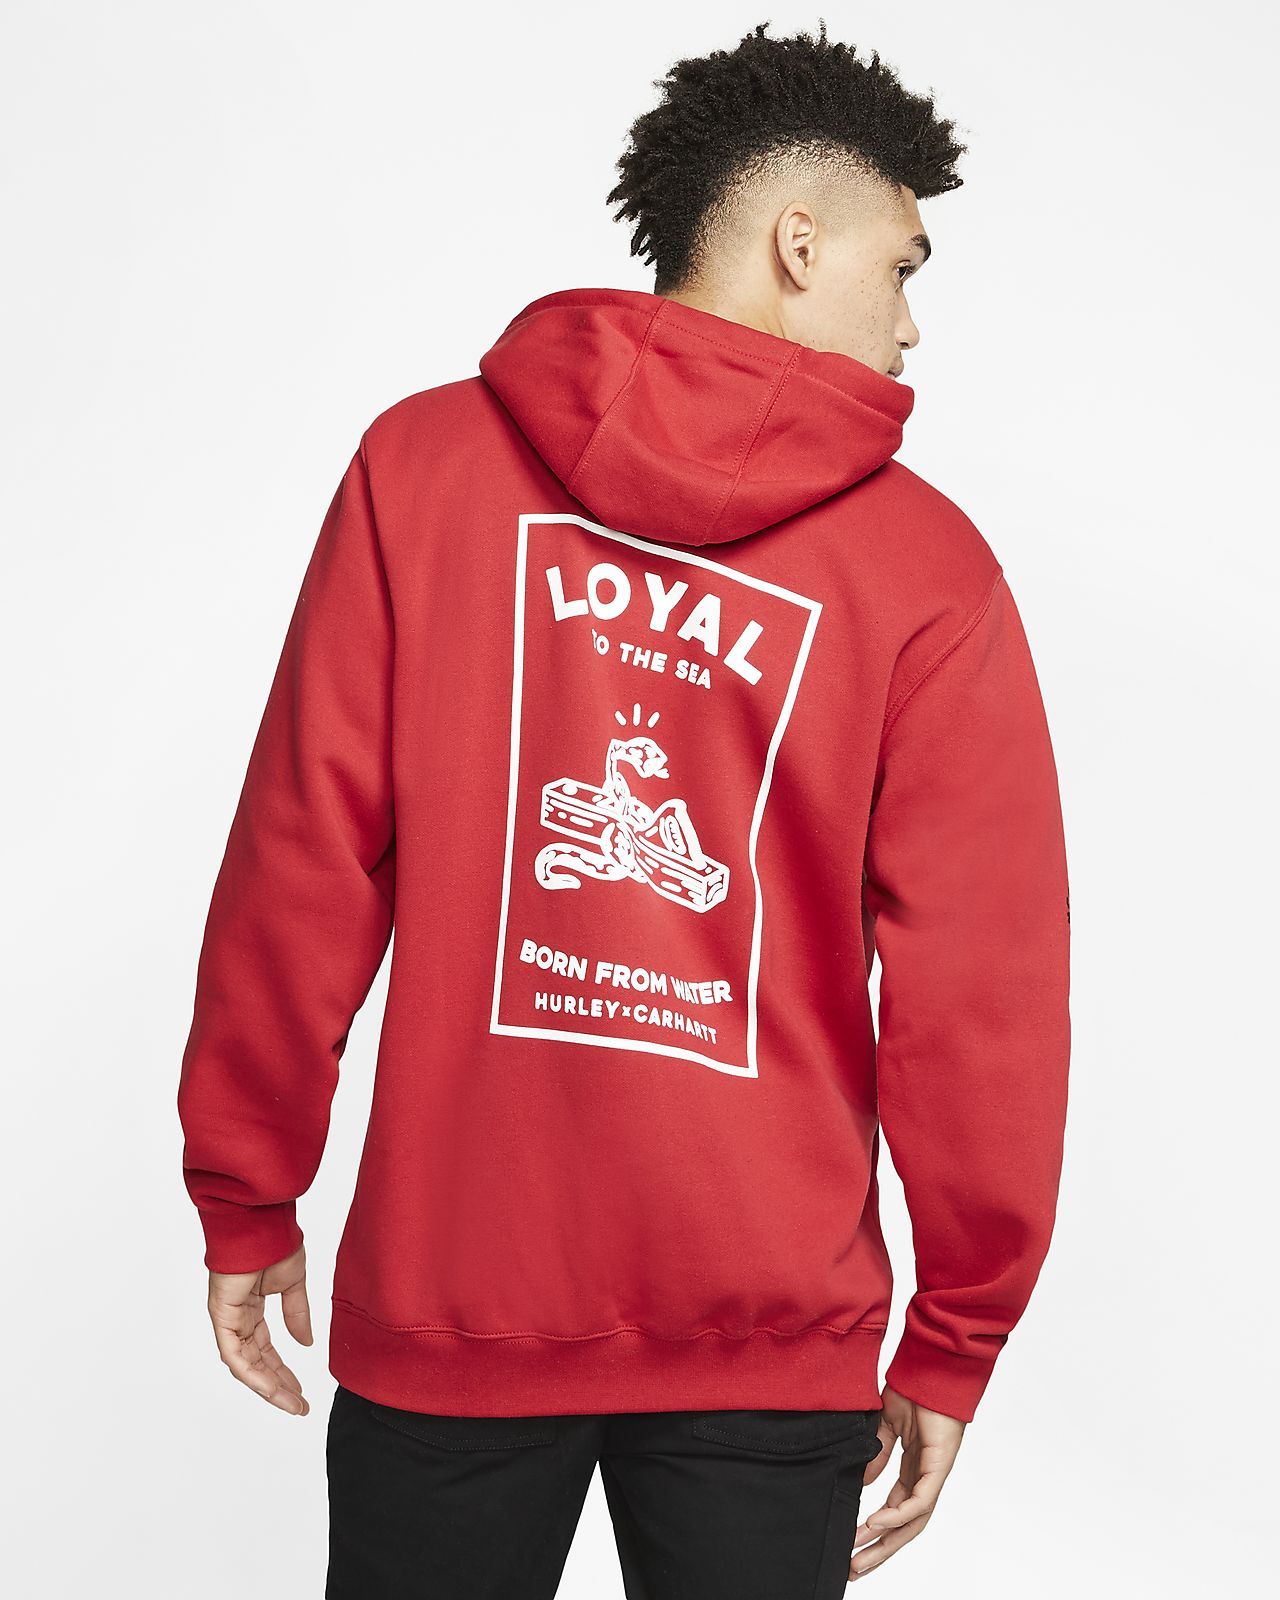 Hurley x Carhartt Loyal Men's Pullover Hoodie